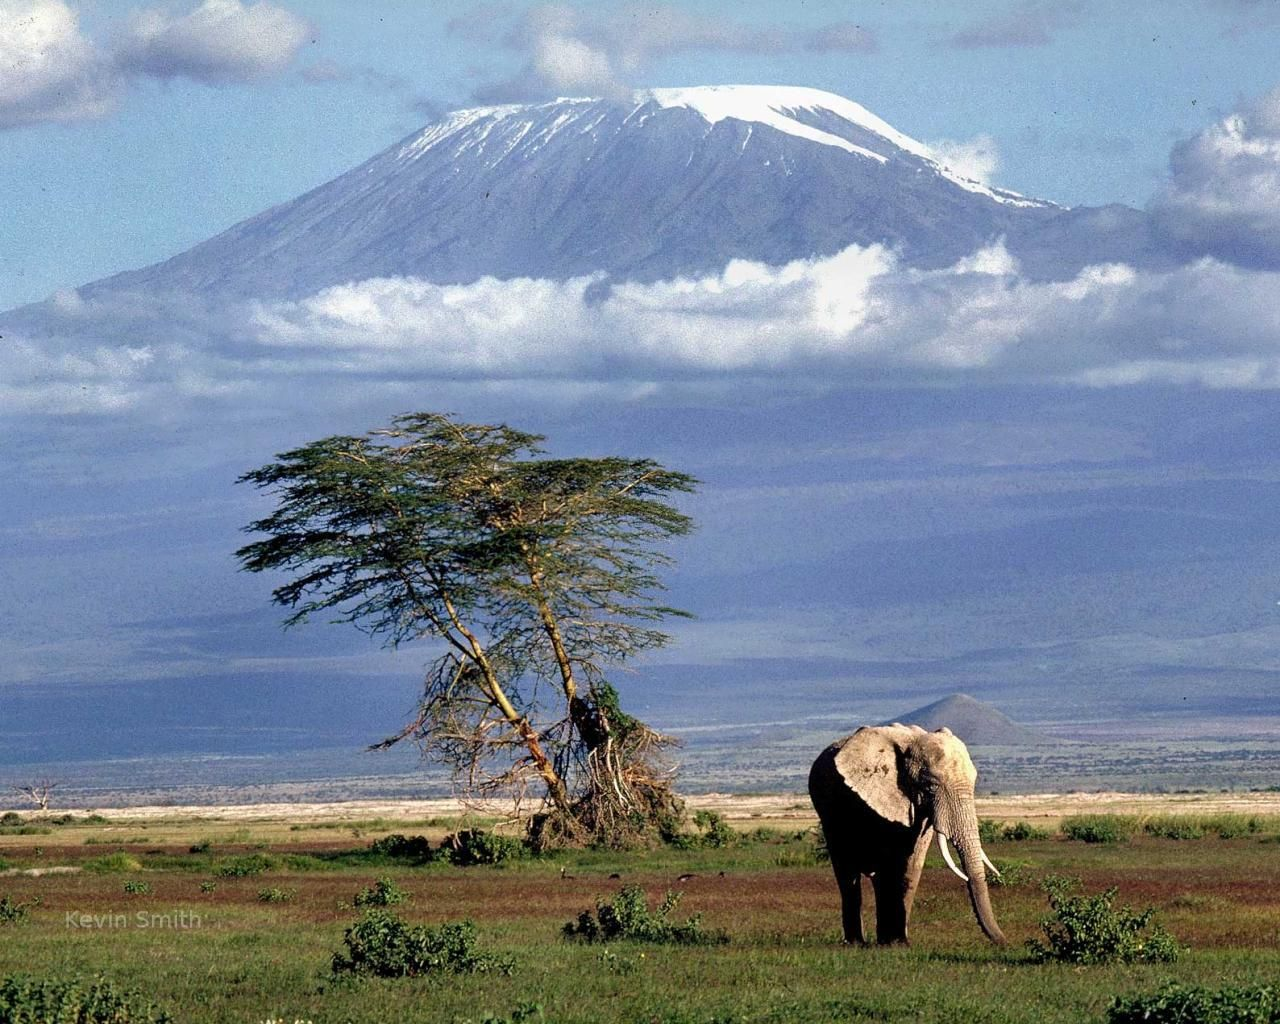 Mount Kilimanjaro National Park, Tanzania